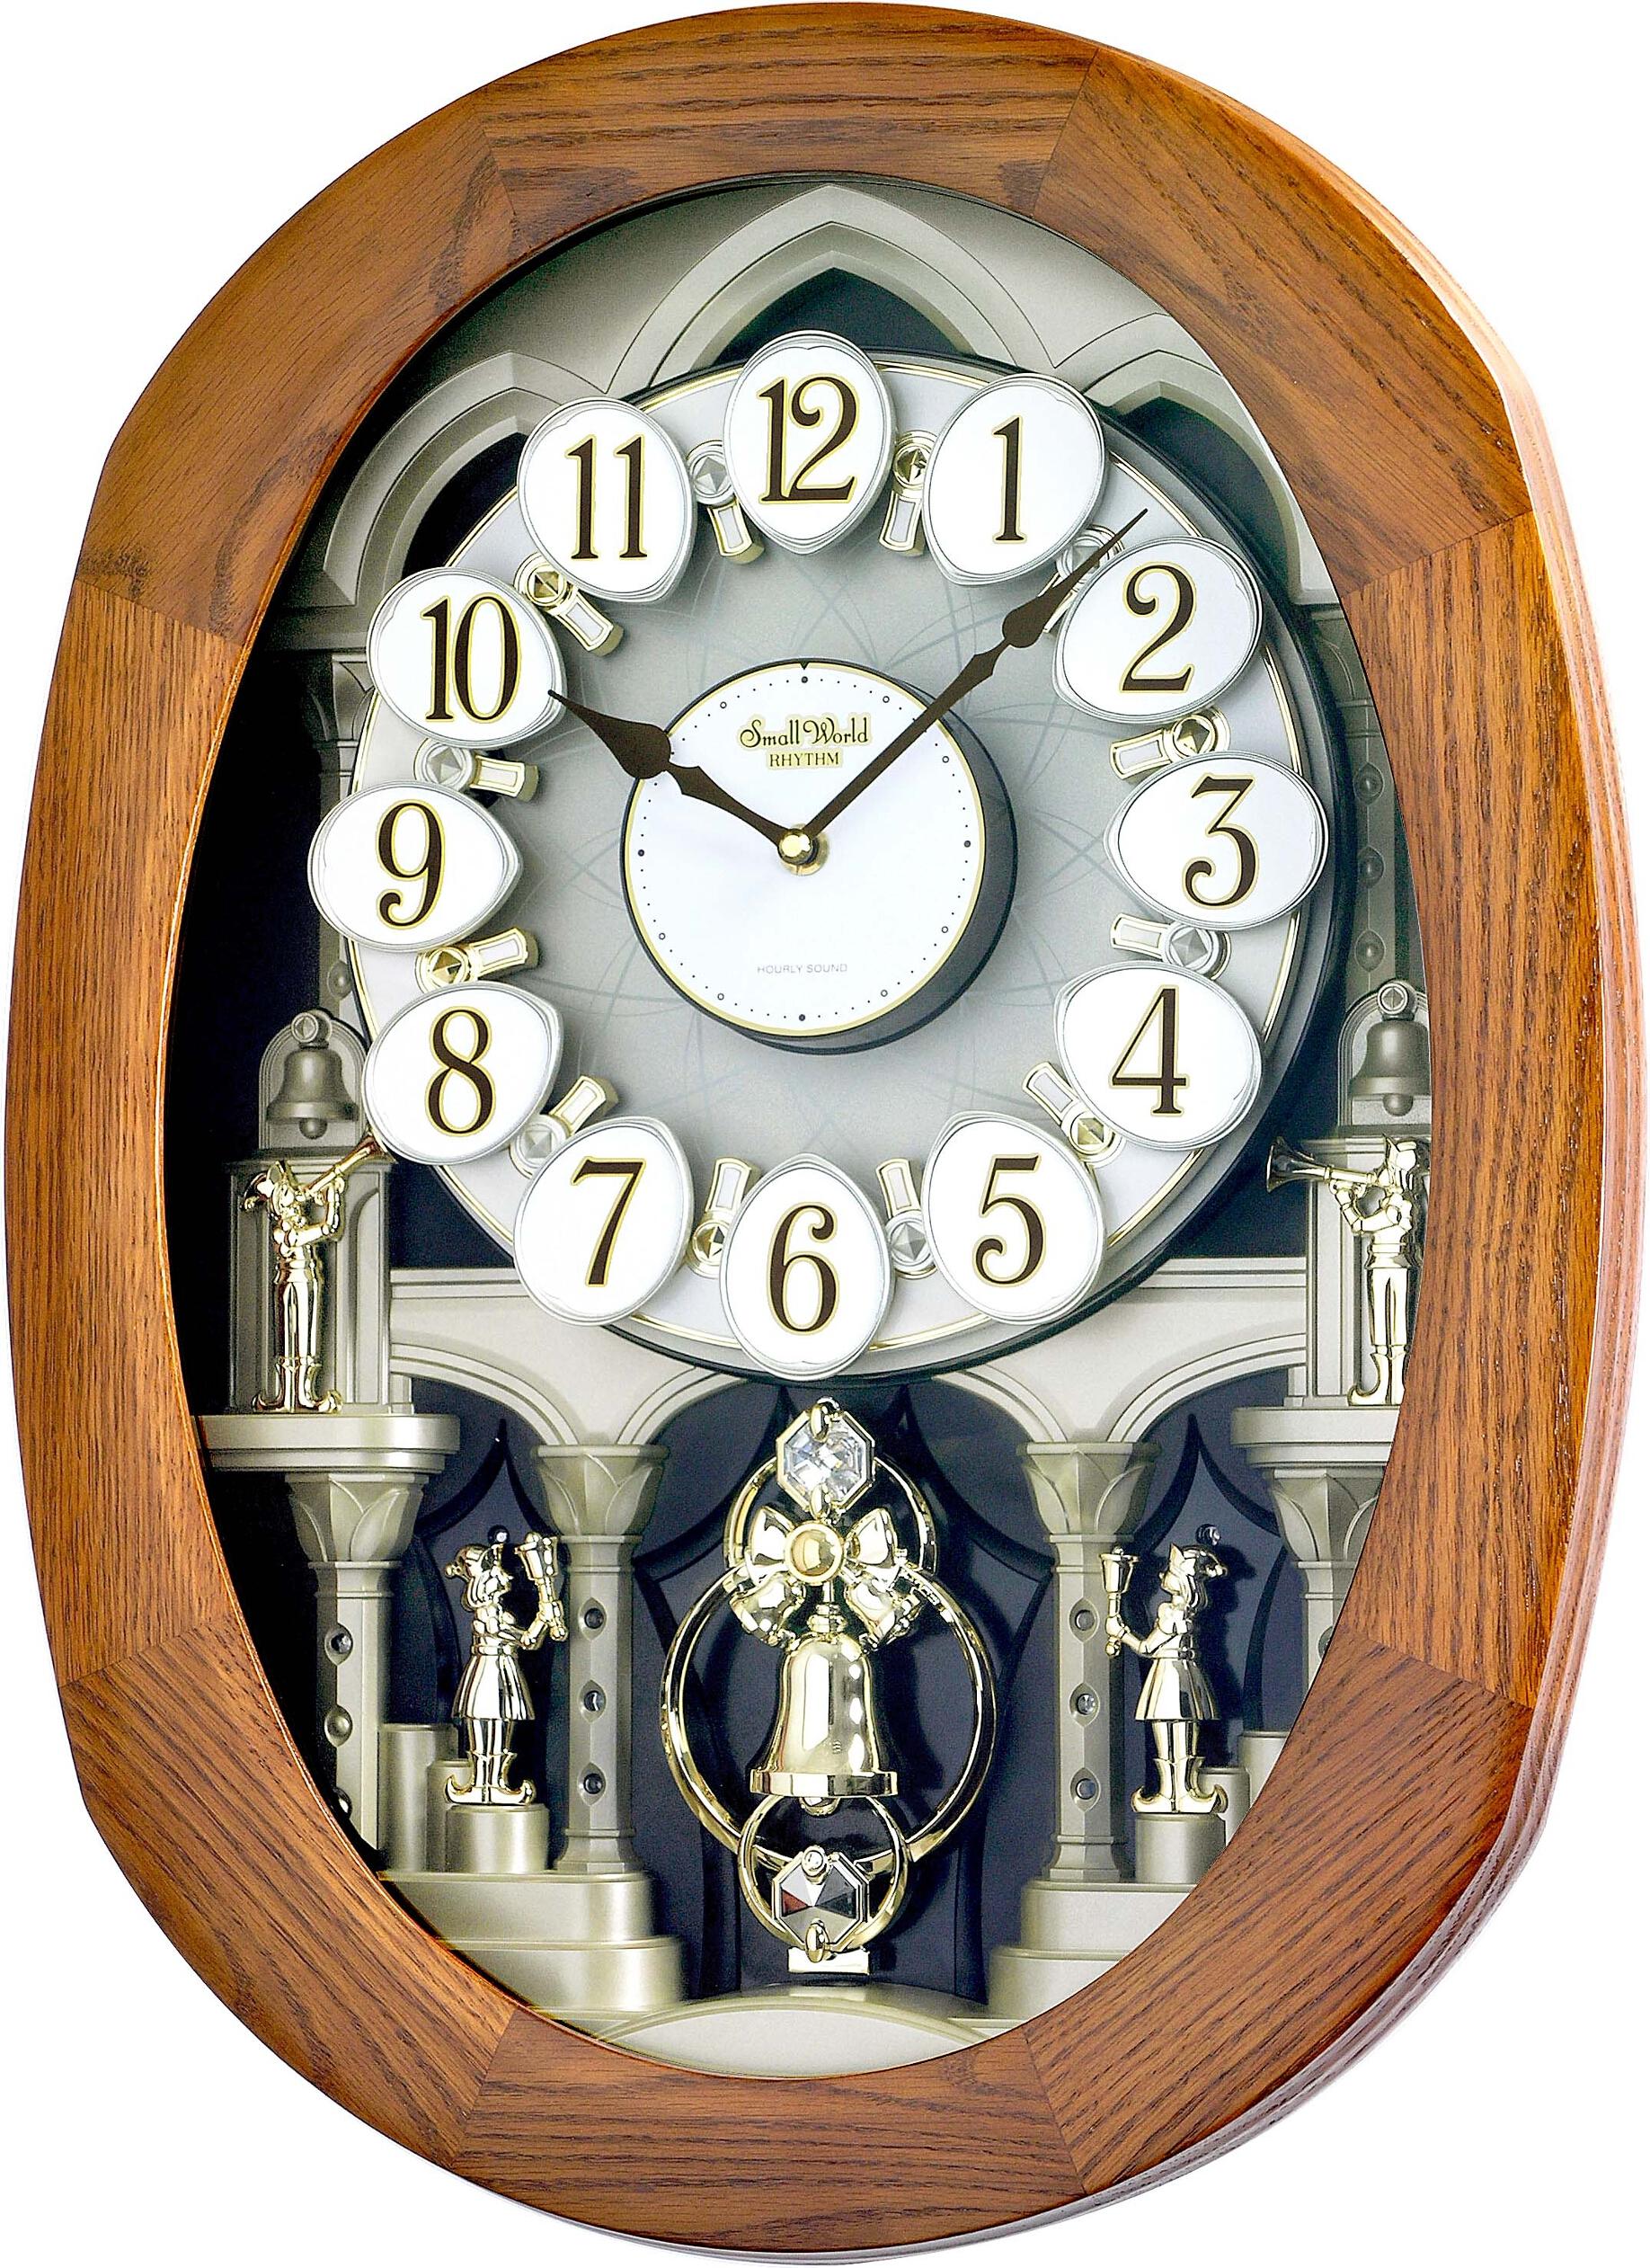 Spring wind wall clocks suburban clock in berea ohio since 1953 4mh847wd06 joyful encore amipublicfo Choice Image